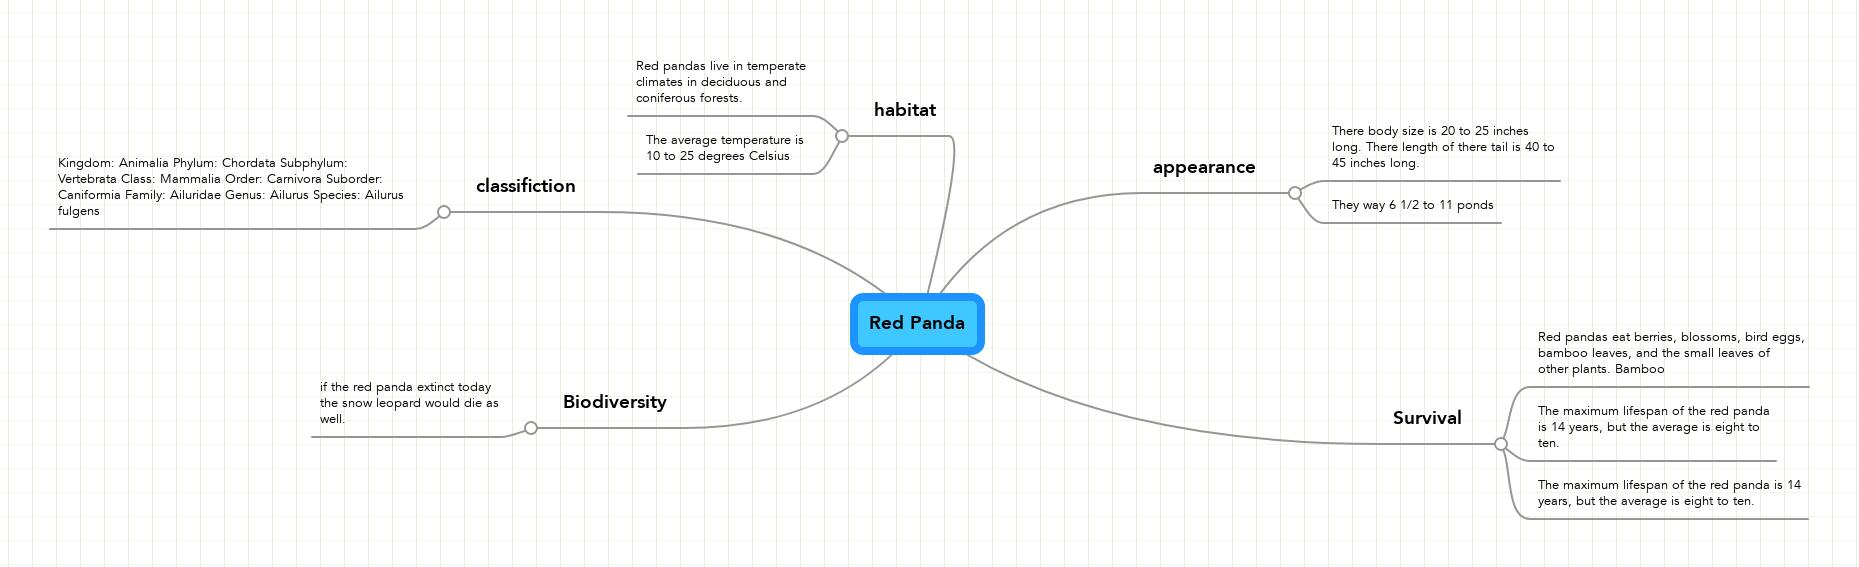 Animal Youtube Red Panda Mindmeister Mind Map